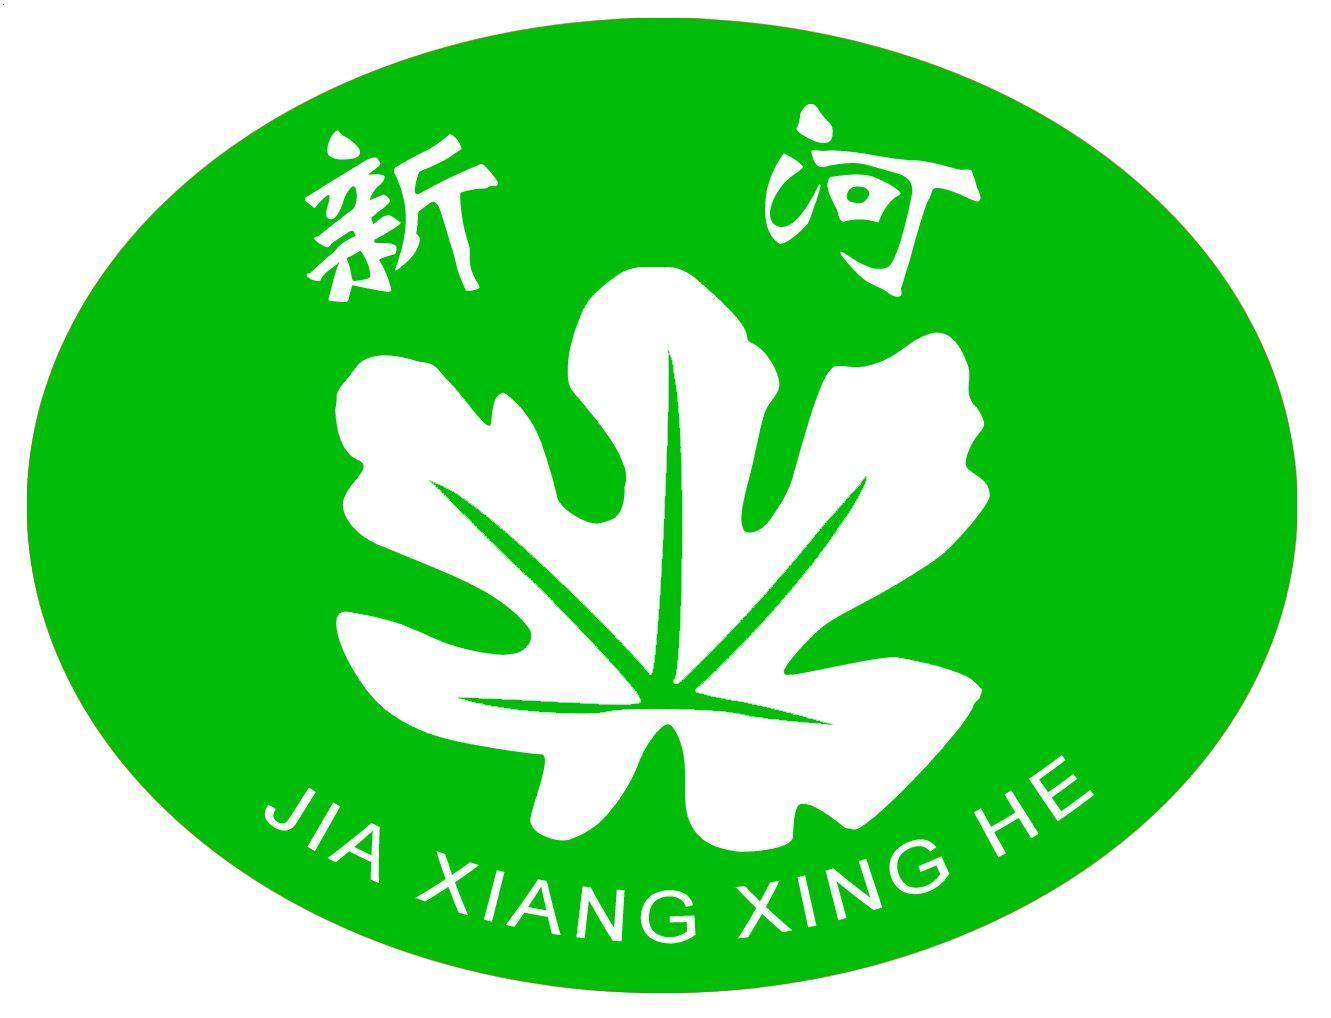 logo logo 标志 设计 图标 1331_1018